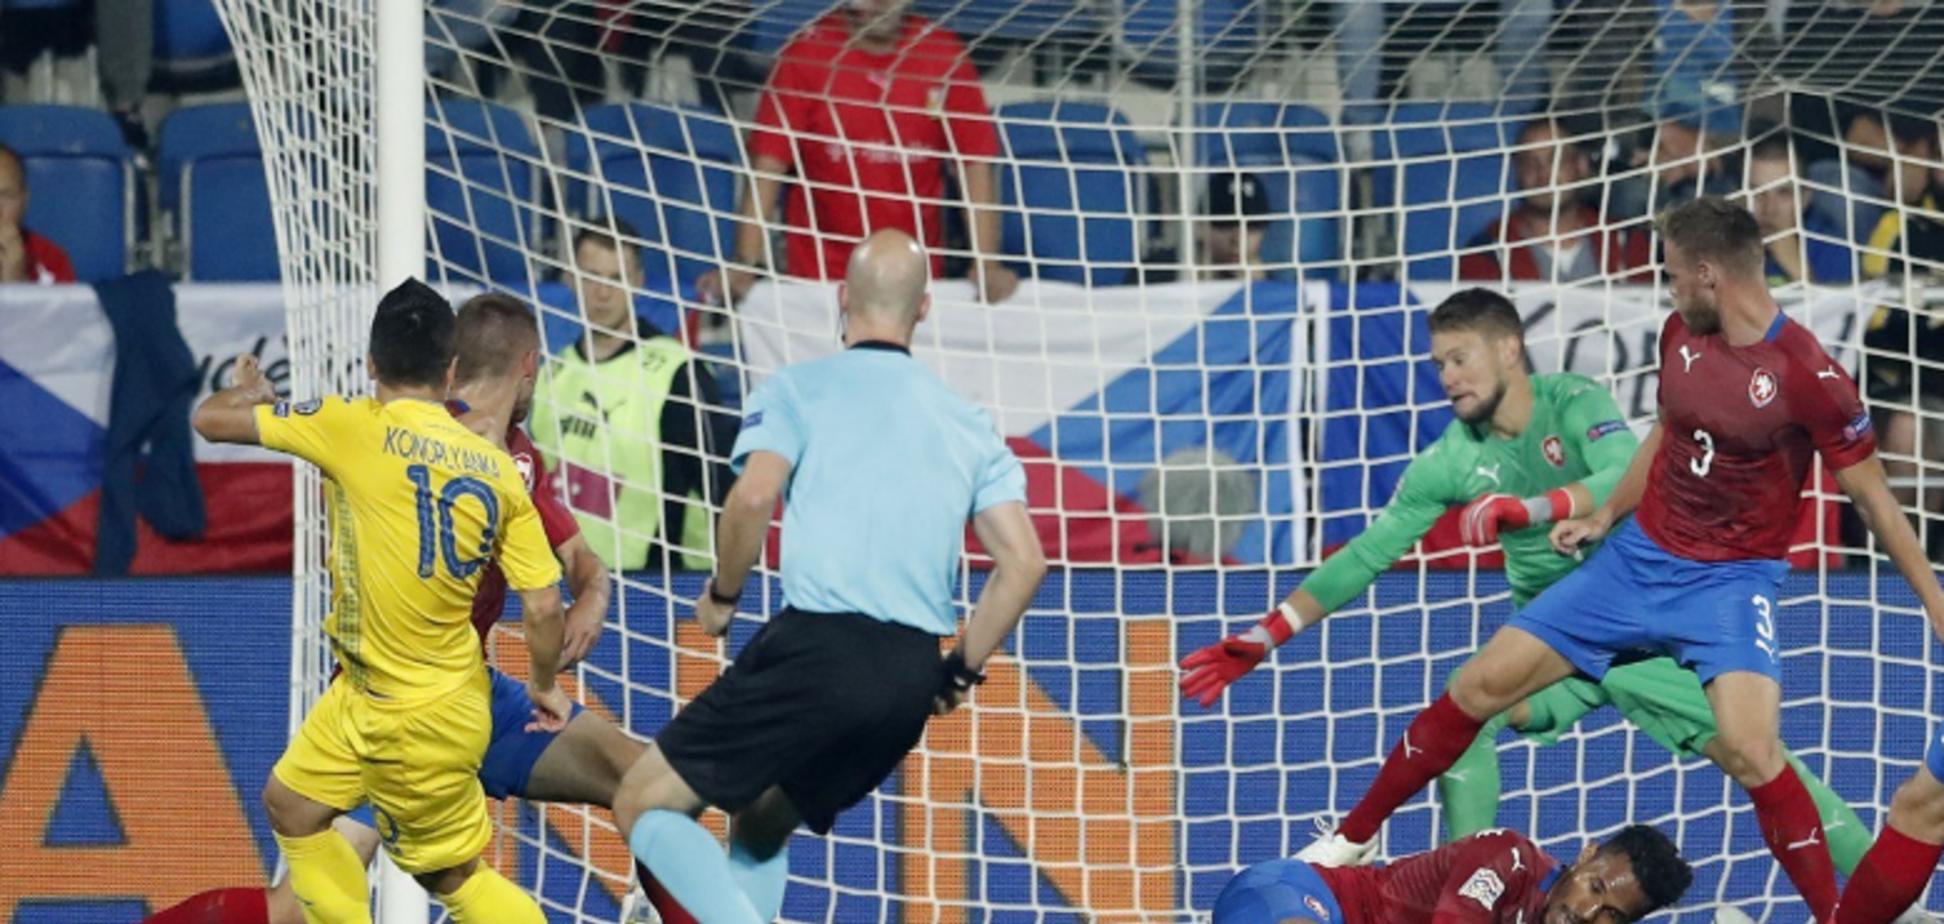 'Романтично': Коноплянка отжег после матча с Чехией